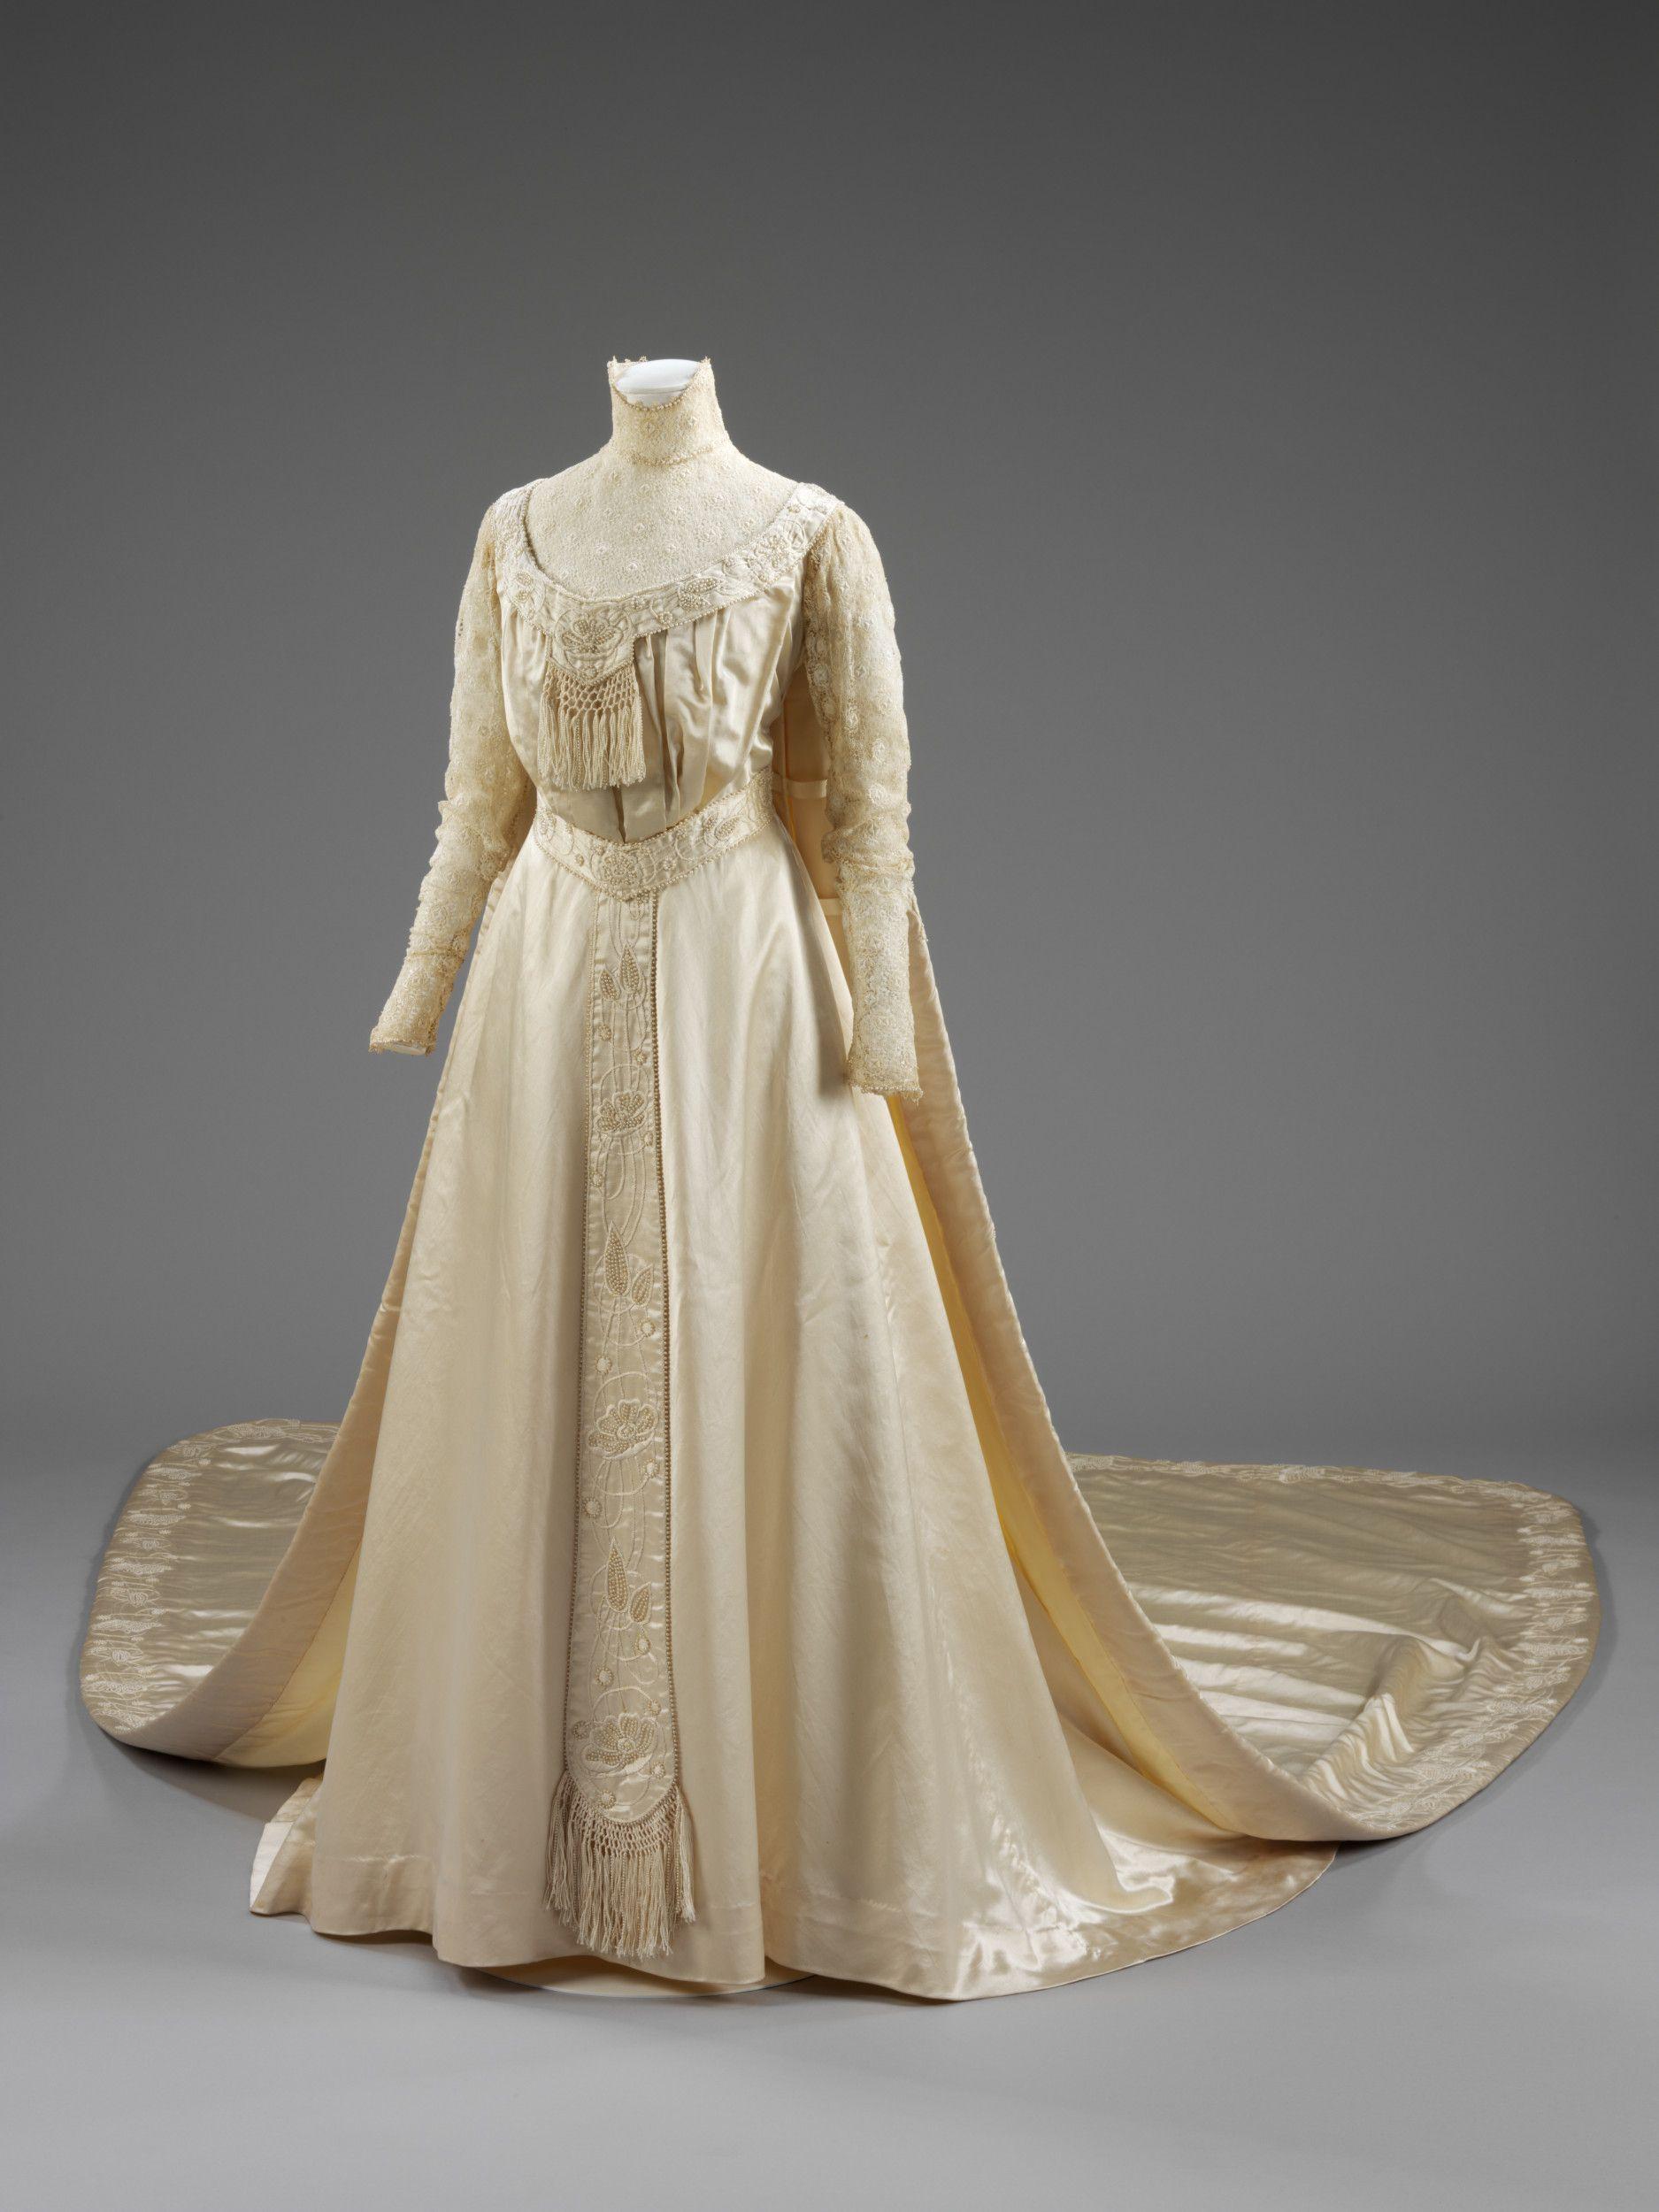 Wedding dress of liberty u co ltd satin with skirt and train c